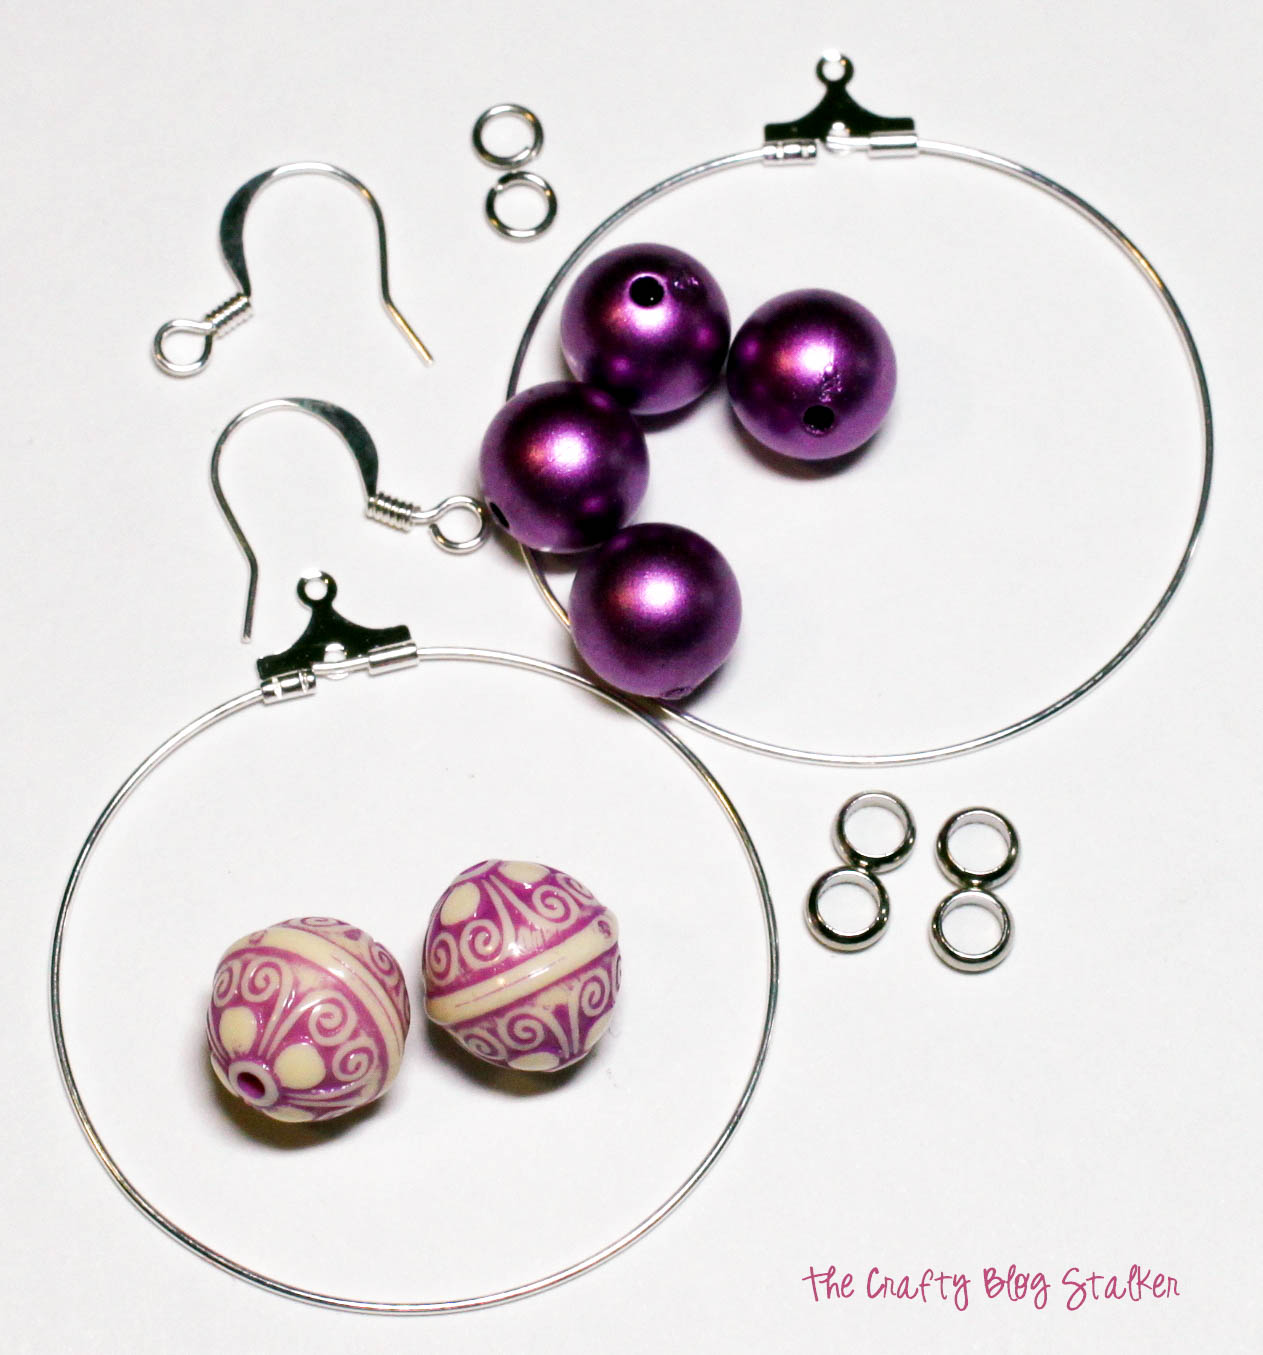 image showing supplies used to Make Large Beaded Hoop Earrings